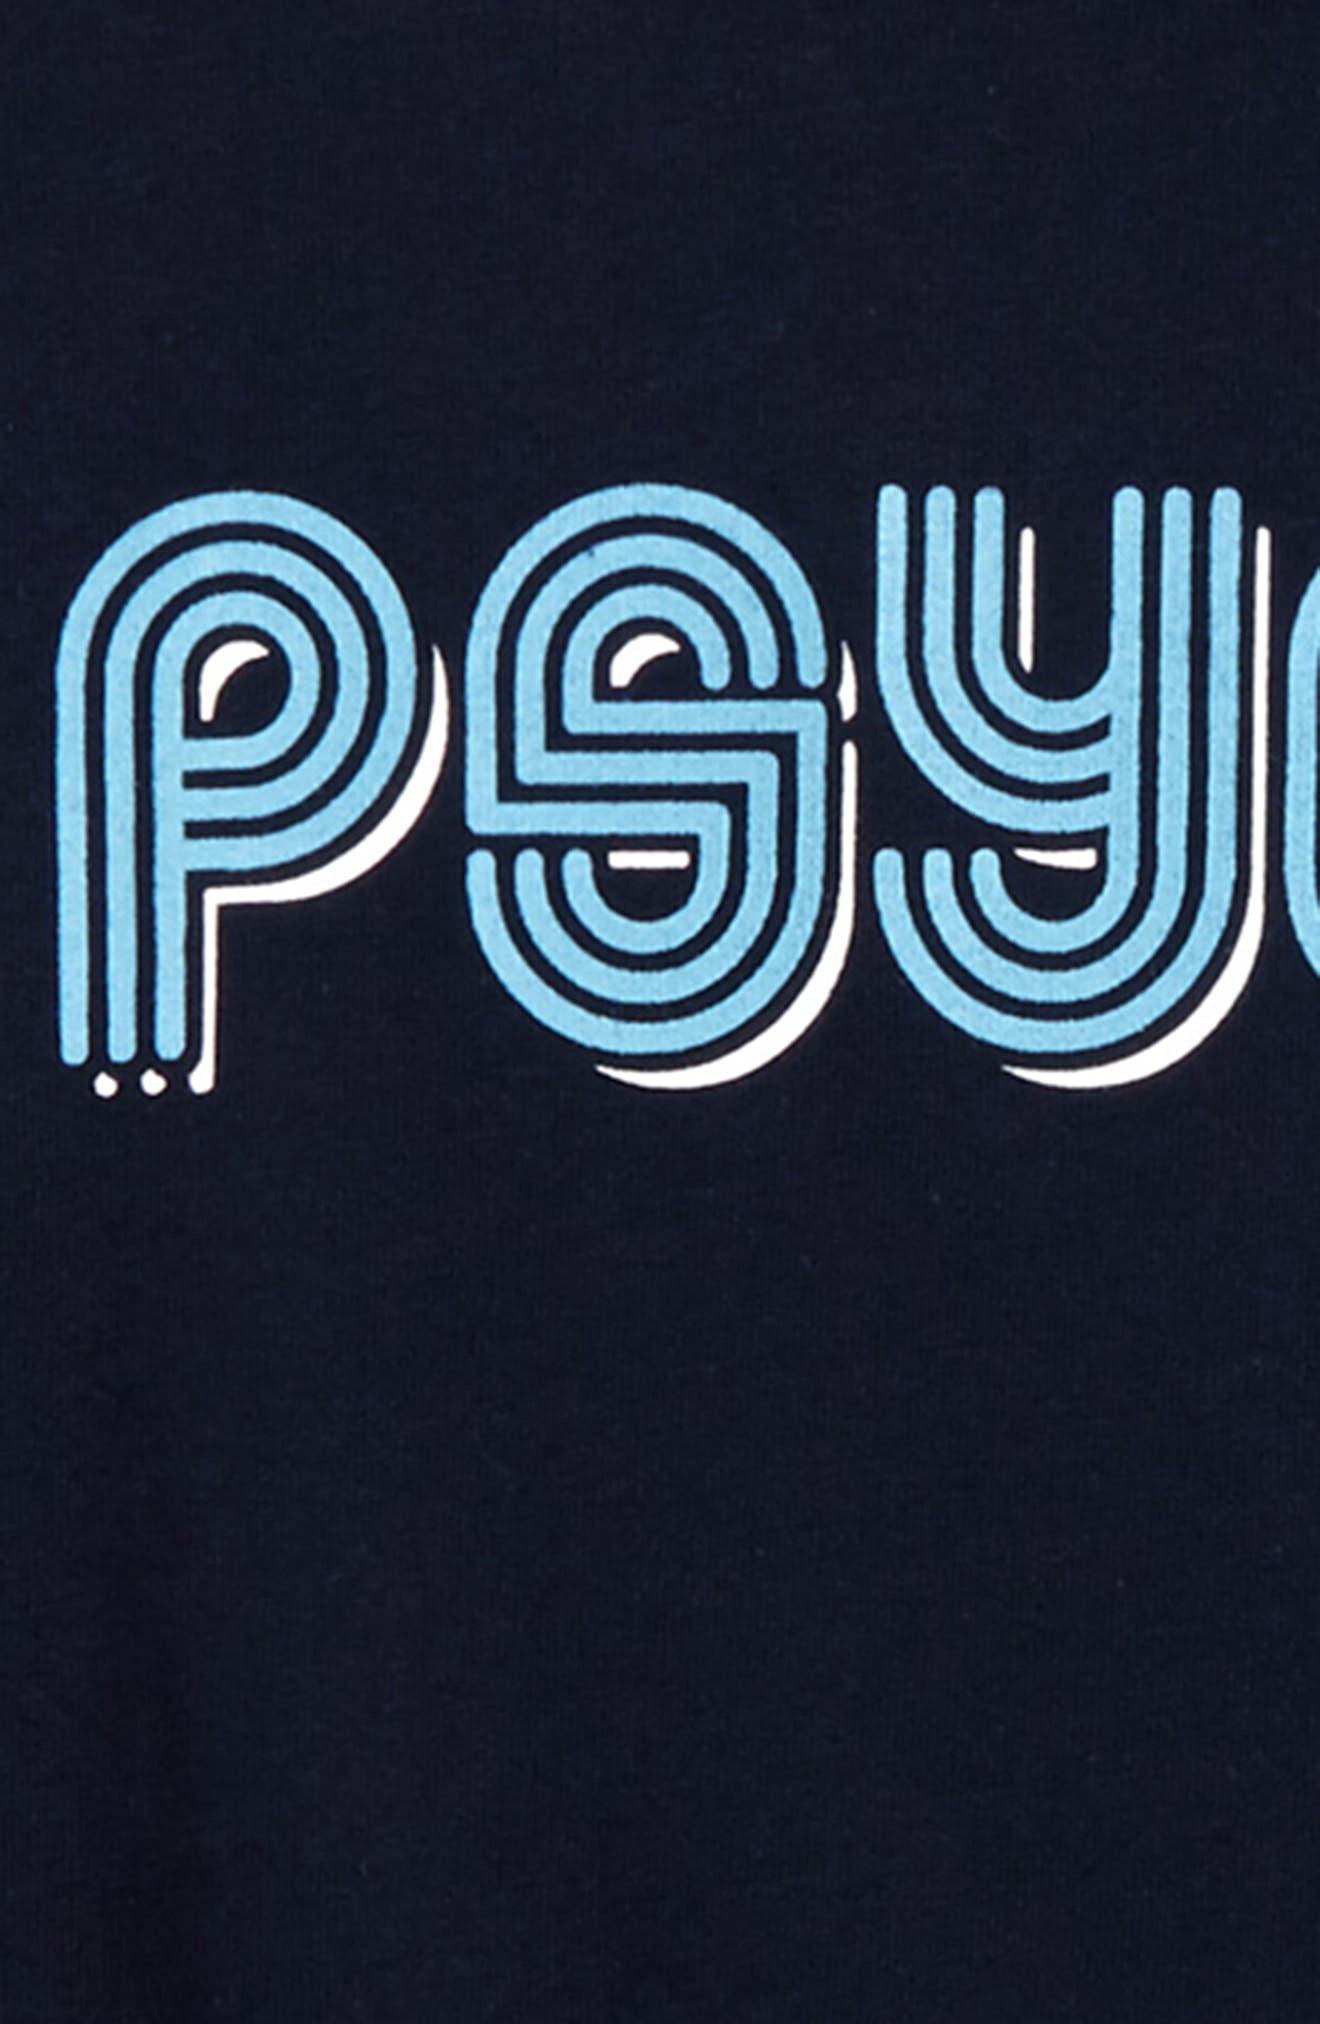 Psyched Print T-Shirt,                             Alternate thumbnail 2, color,                             400